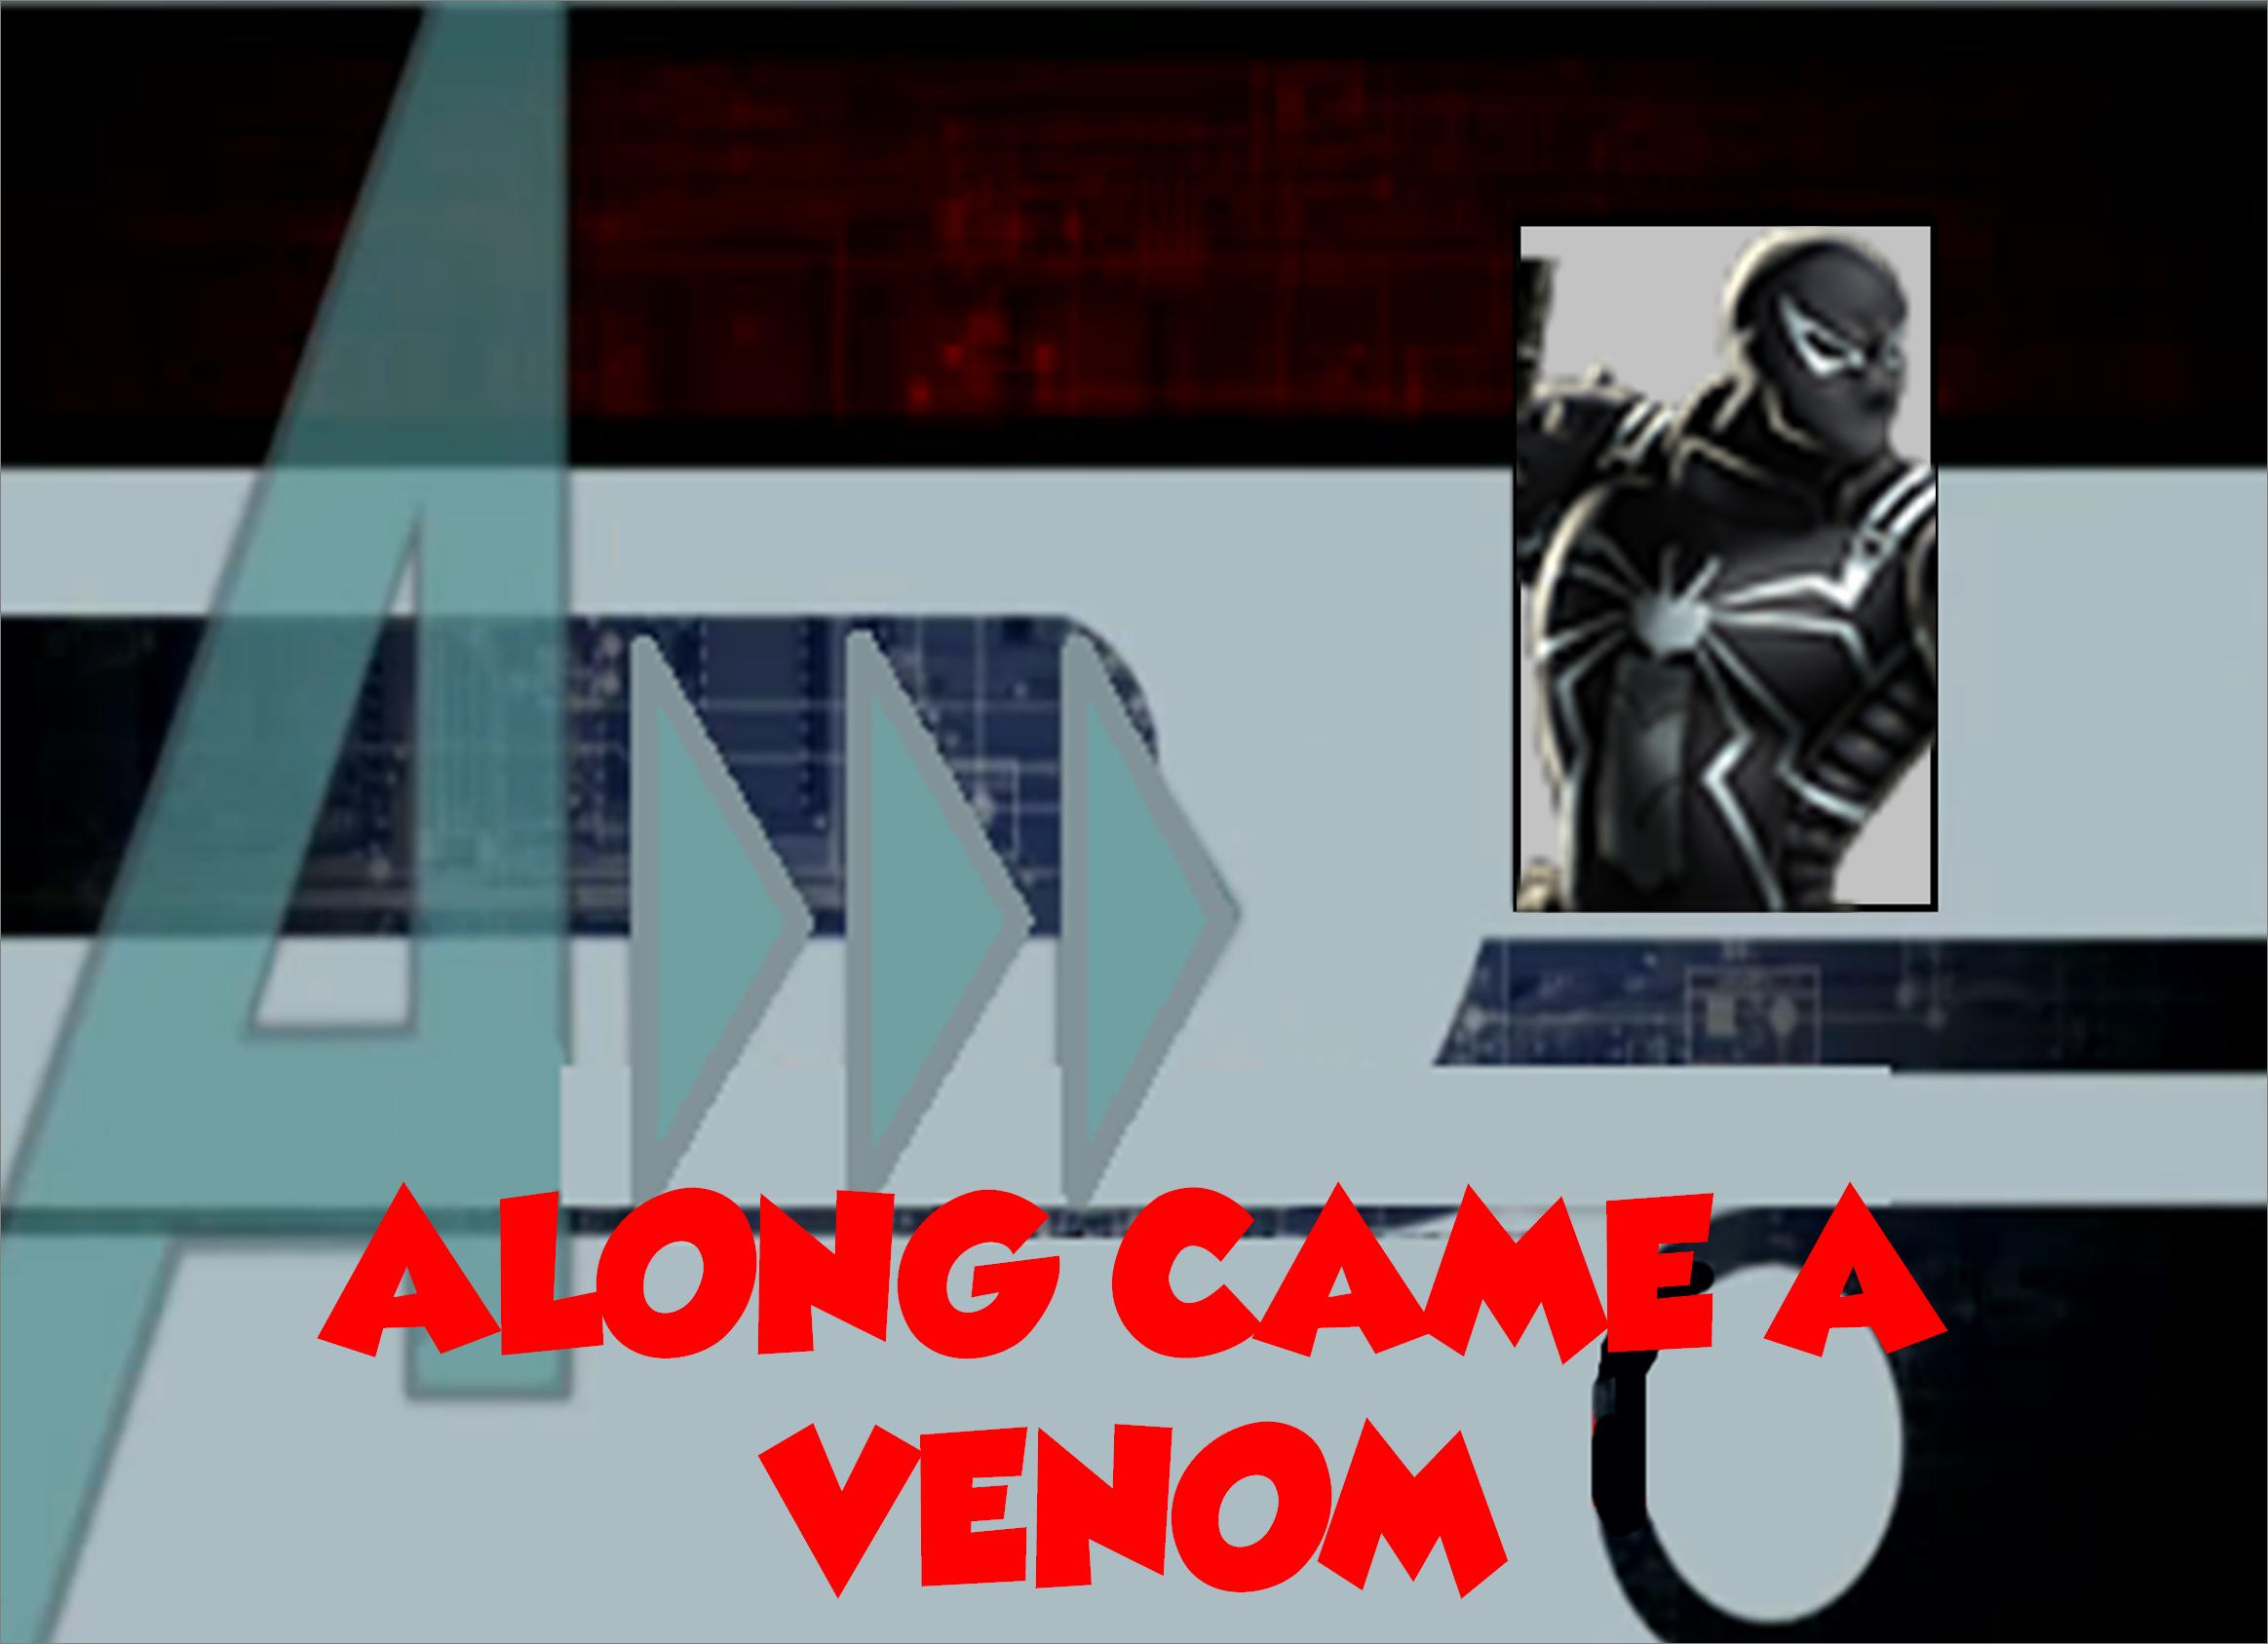 Along Came a Venom (A!)